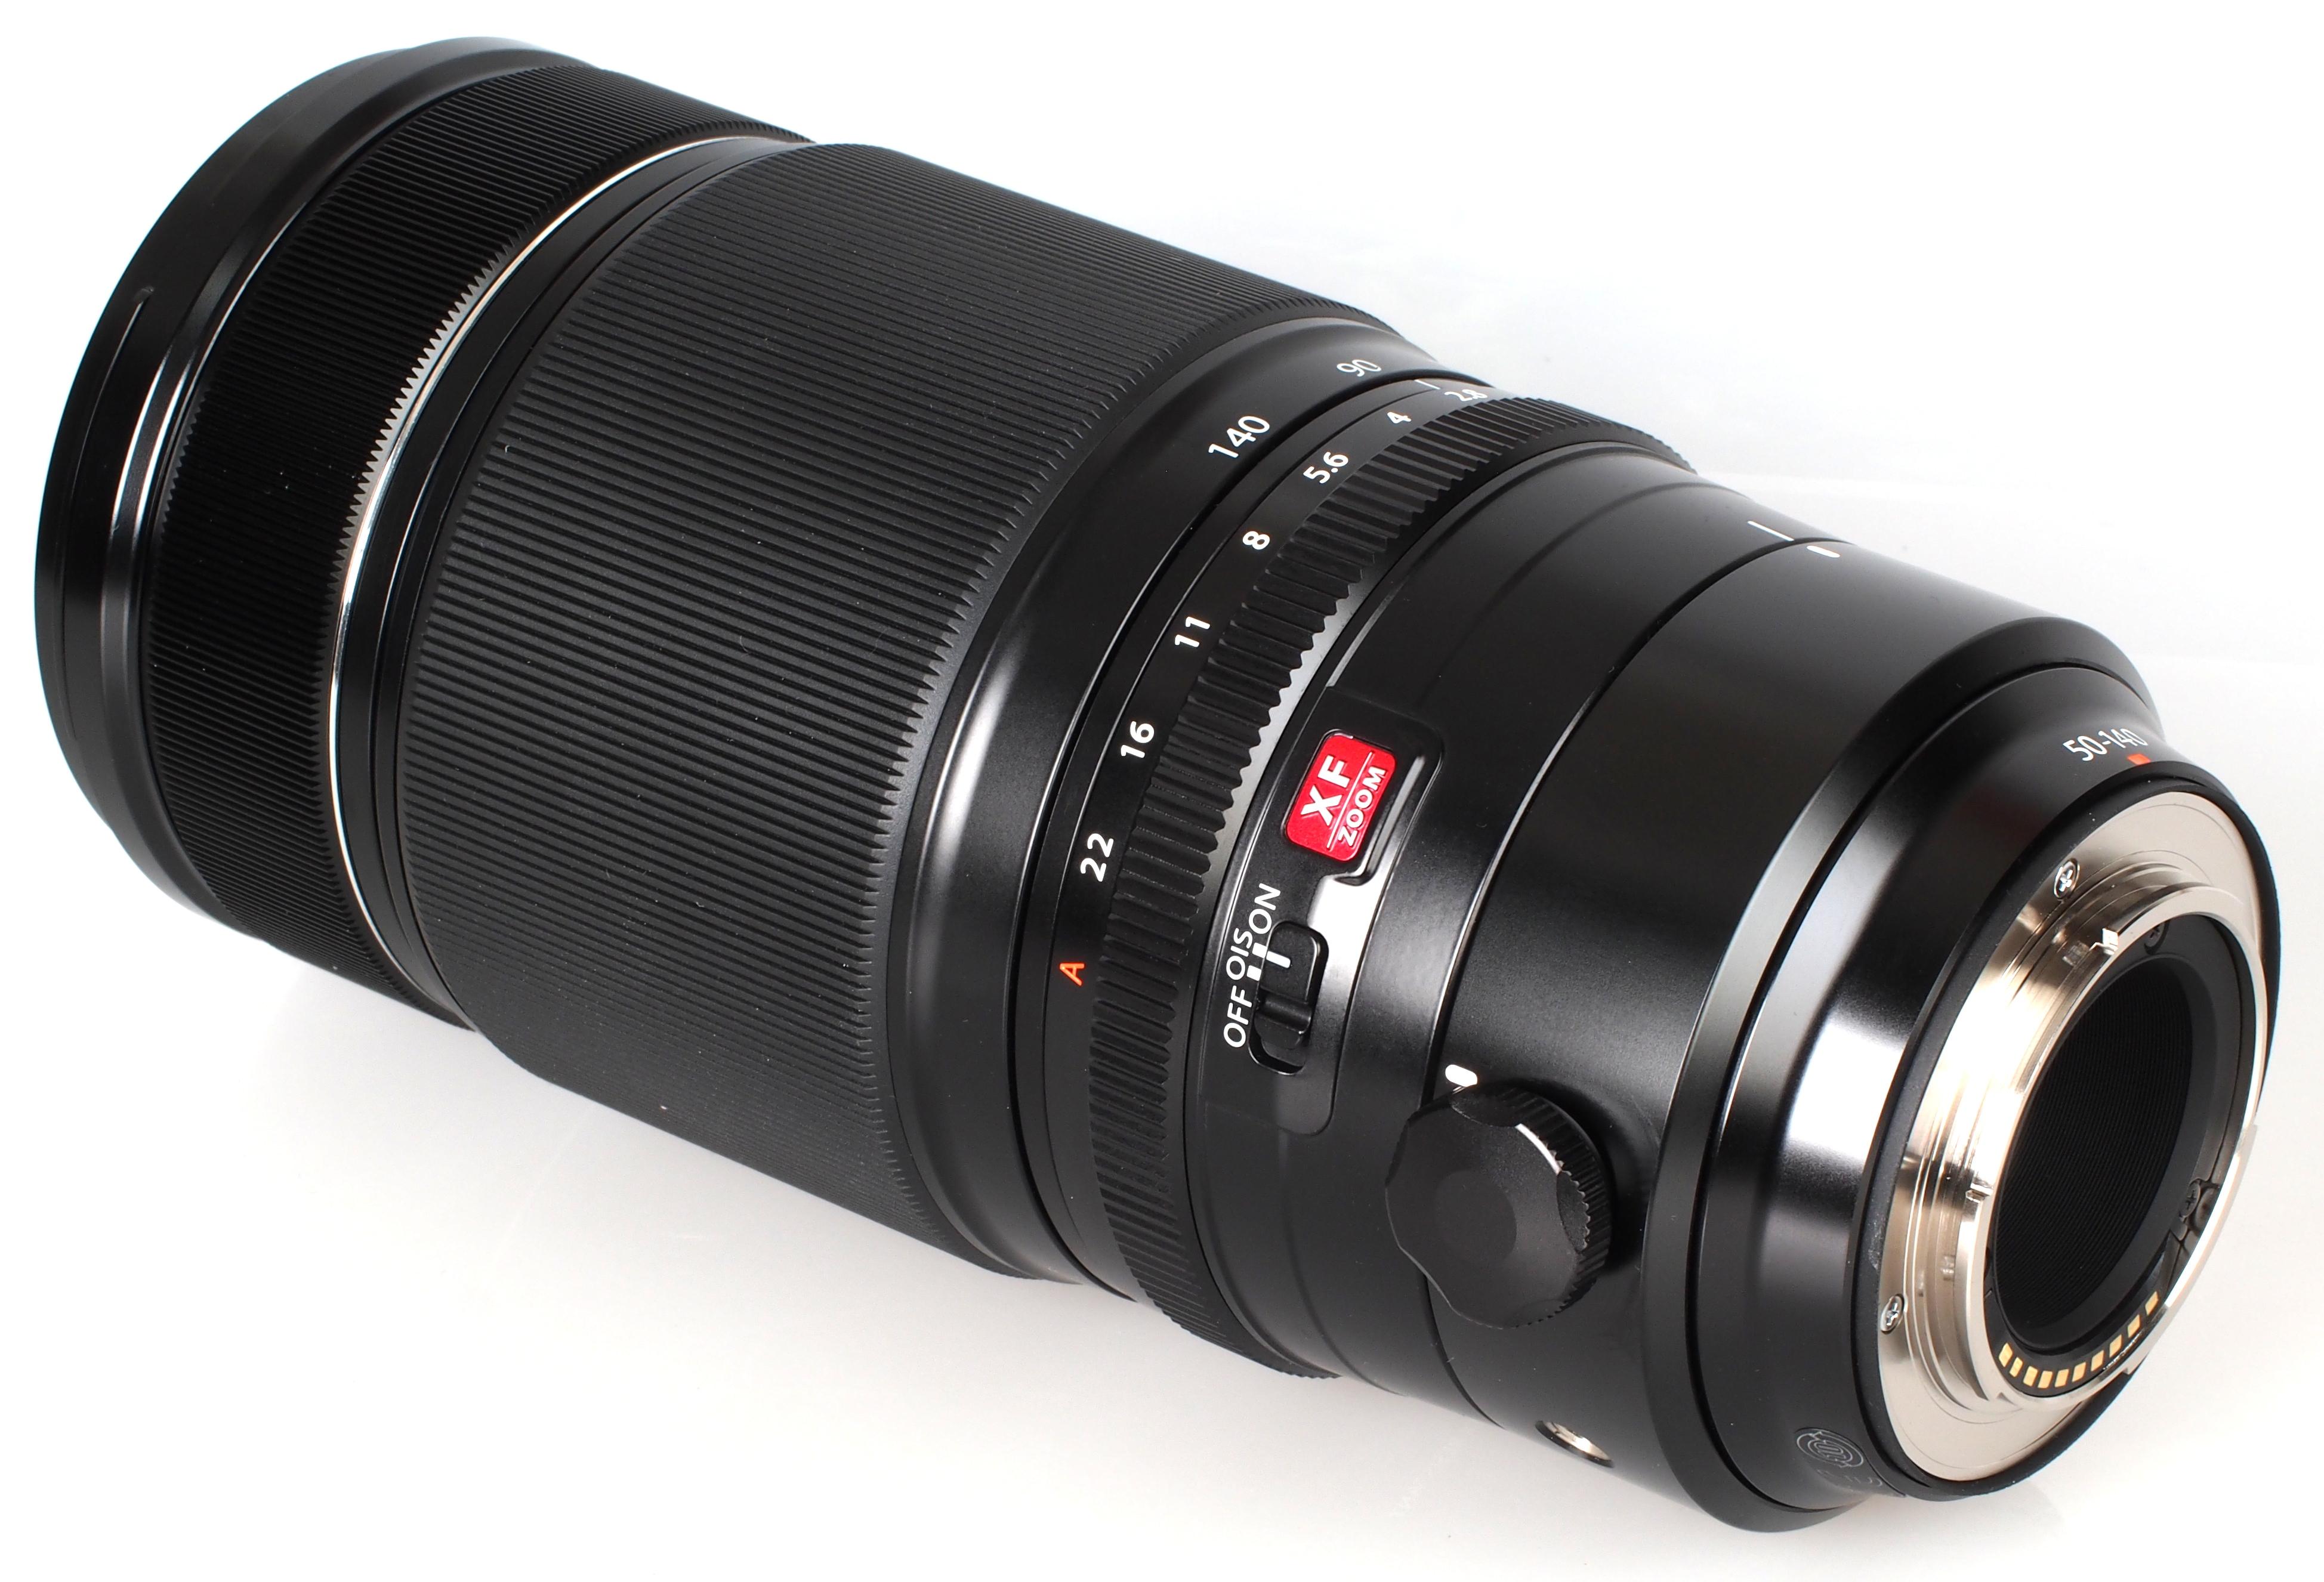 Top 13 Best Fujifilm Lenses Reviewed 2018 X E3 Kit Xf 23mm F2 Black 35mm Fujinon 50 140mm Lens 6